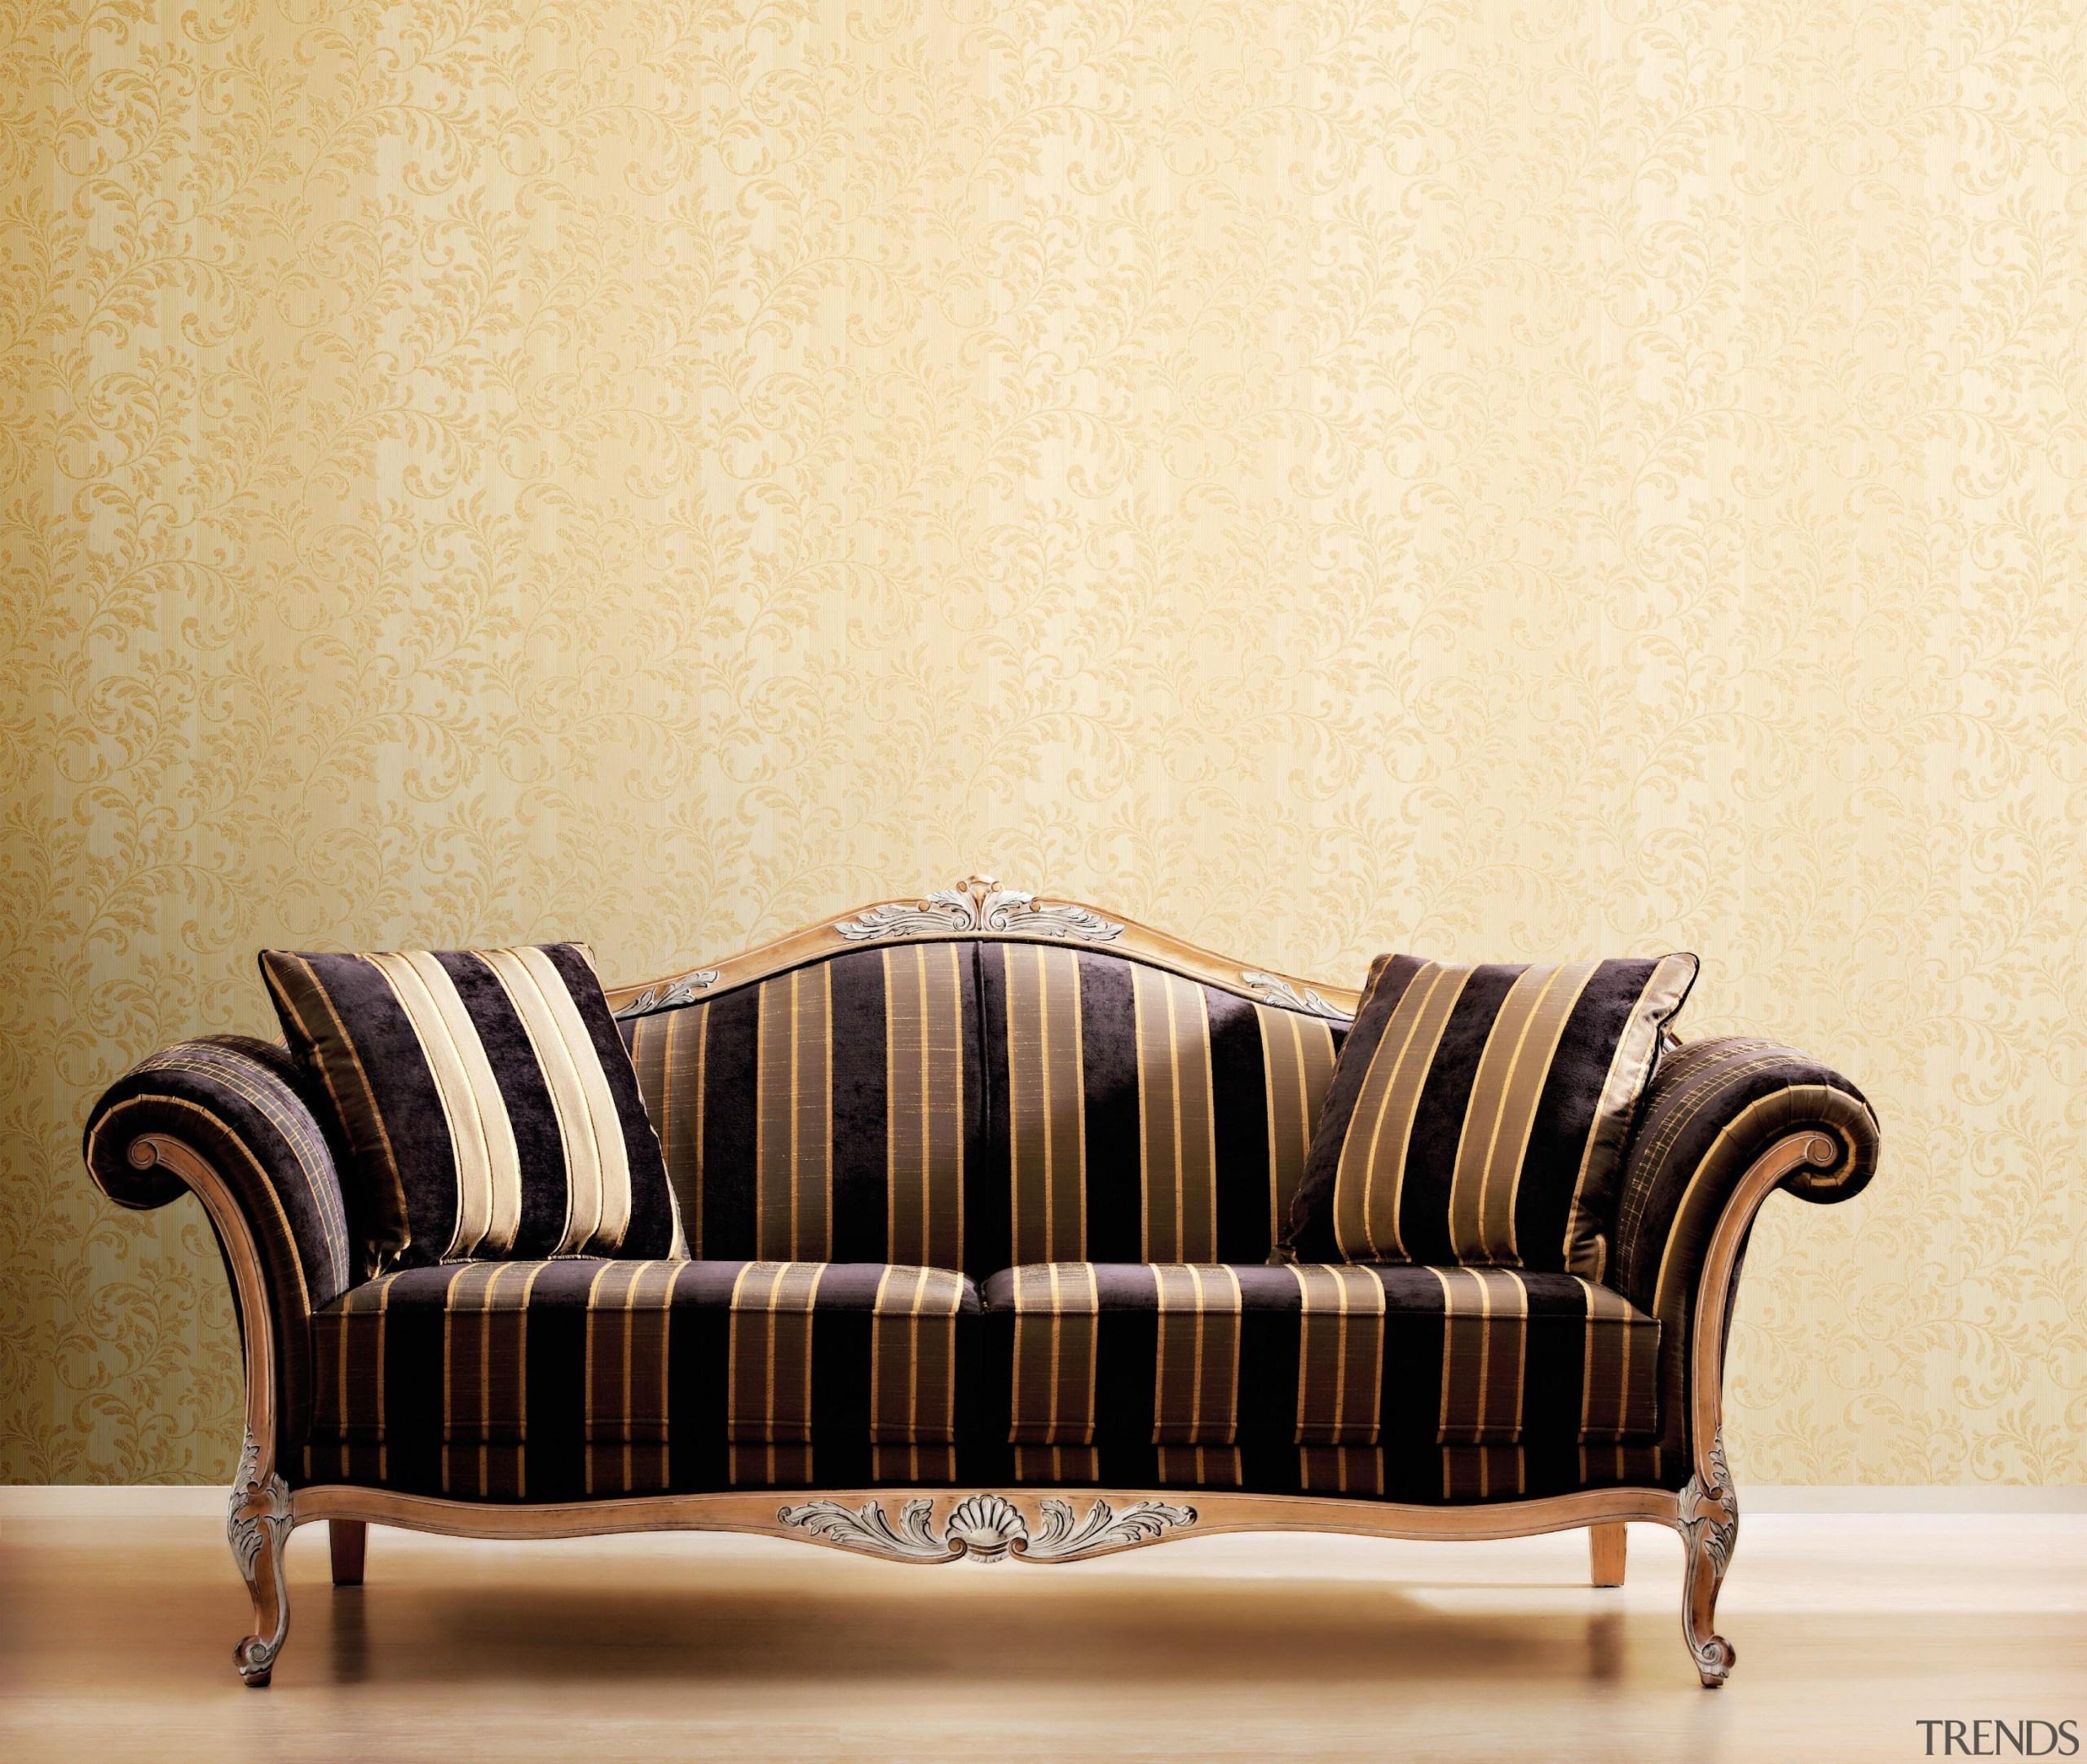 New Belaggio Range - New Belaggio Range - chaise longue, couch, furniture, interior design, loveseat, product design, sofa bed, studio couch, table, wall, yellow, orange